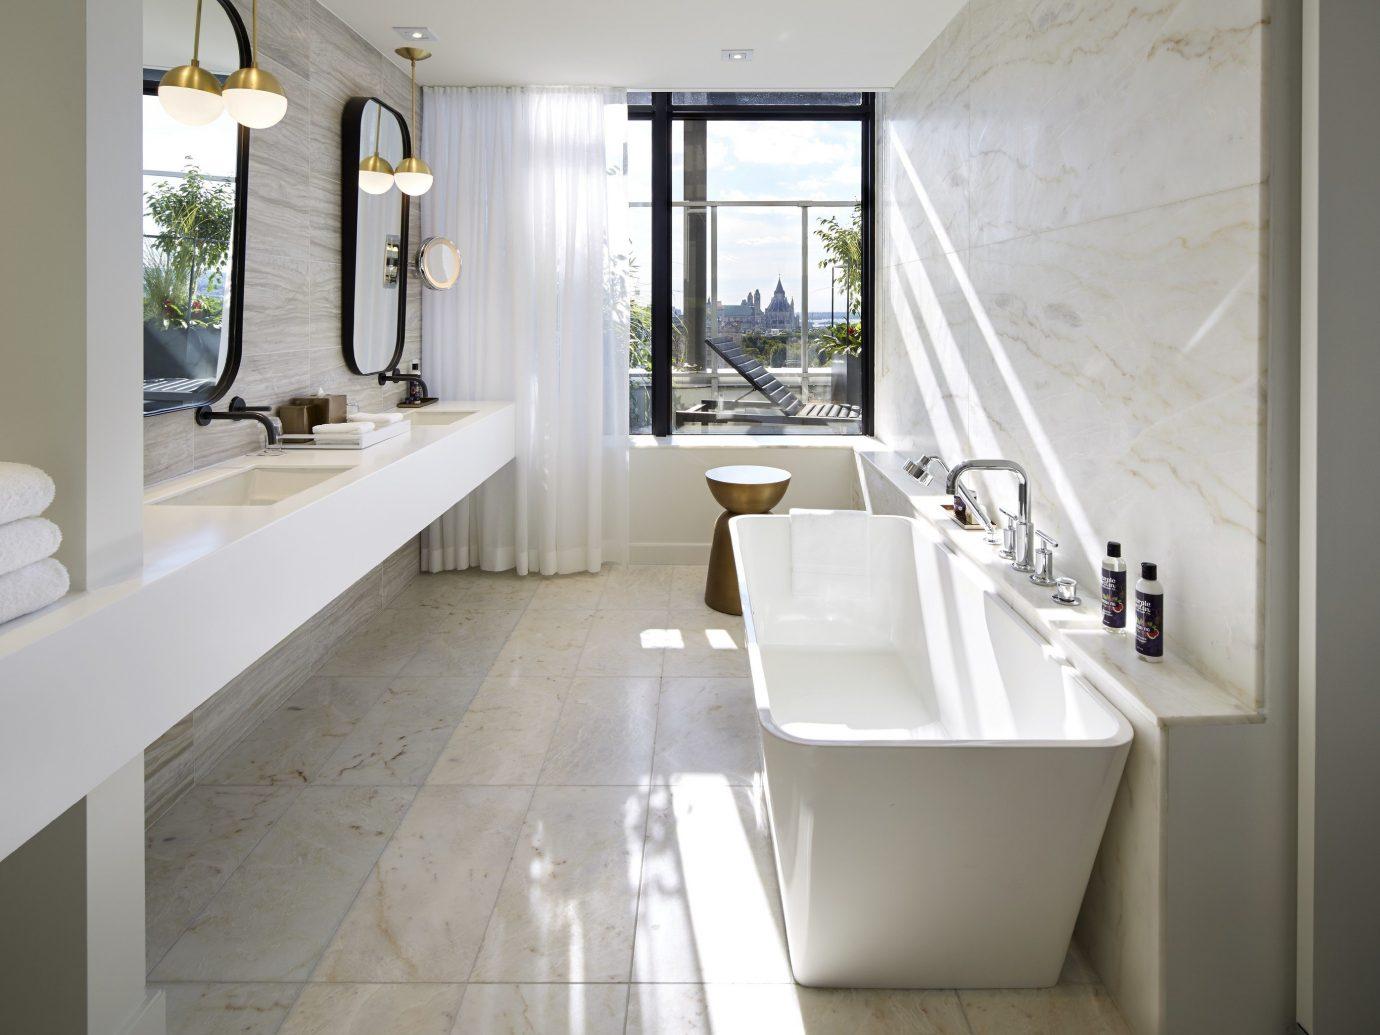 Trip Ideas indoor wall bathroom floor room property window toilet house home interior design estate bathtub Design real estate plumbing fixture flooring apartment tub Bath